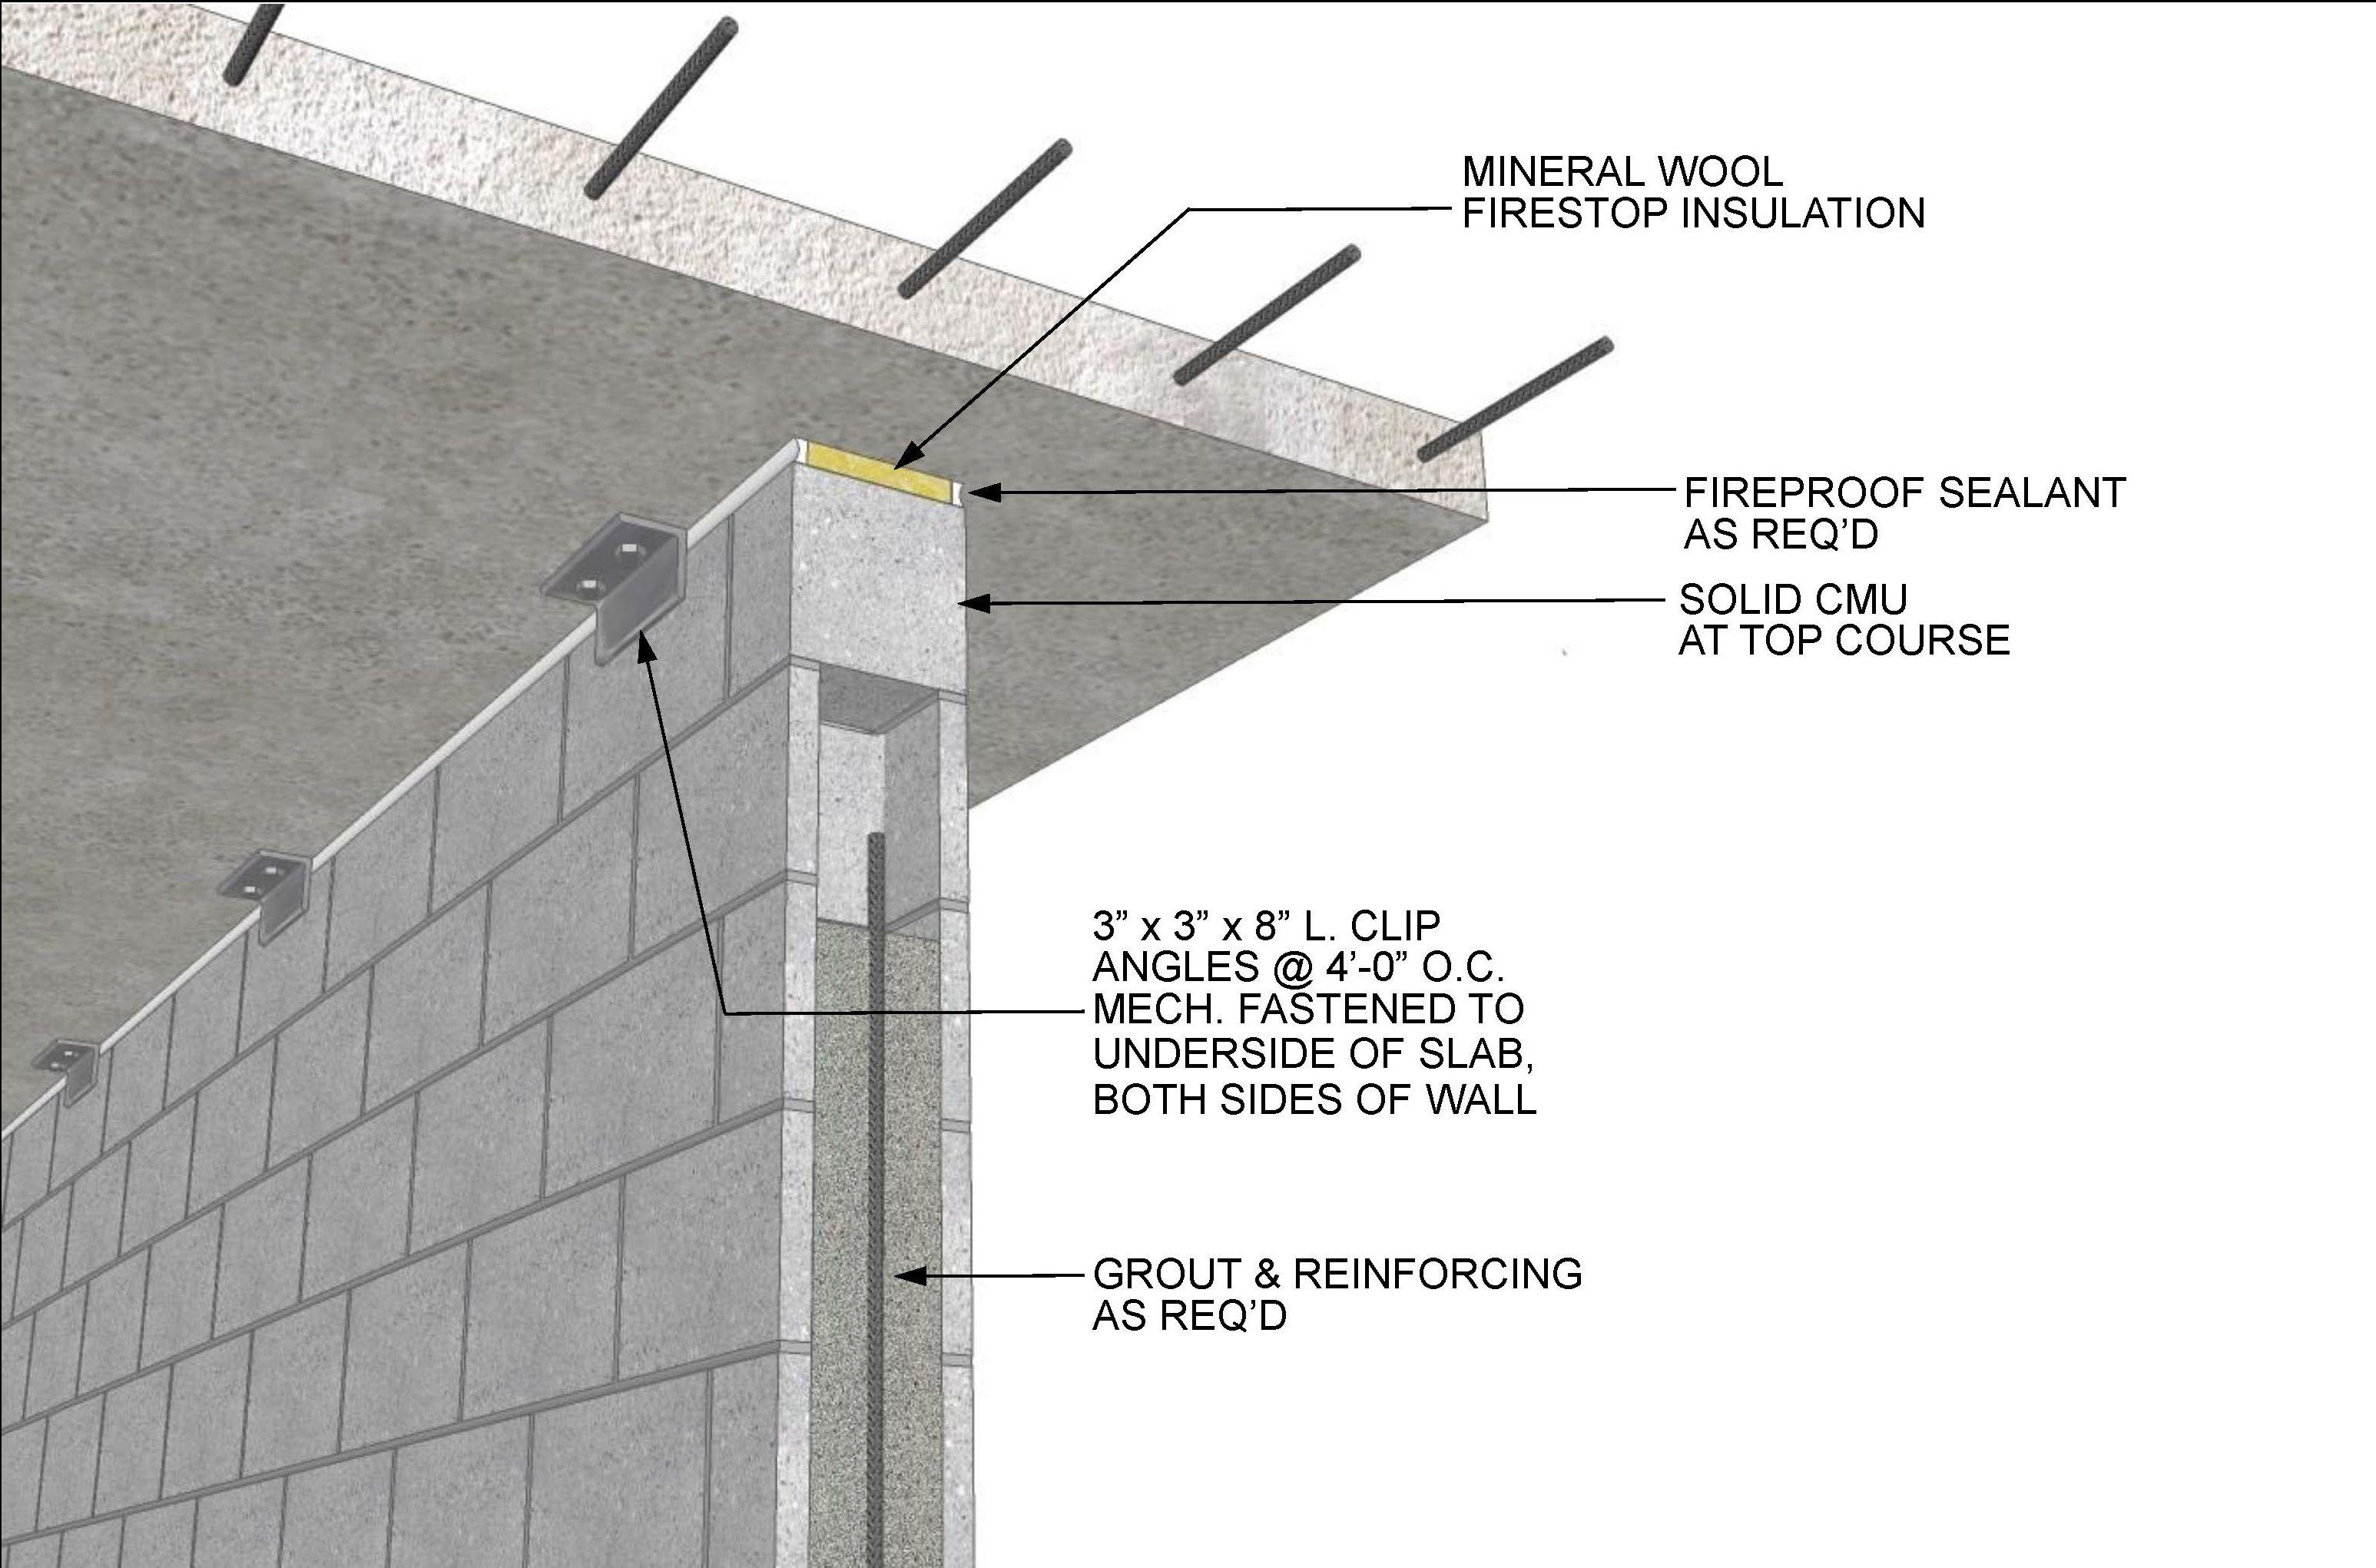 Toronto Concrete Forming Gbc Concrete Forming In 2020 Green Building Construction Concrete Forms Building Construction